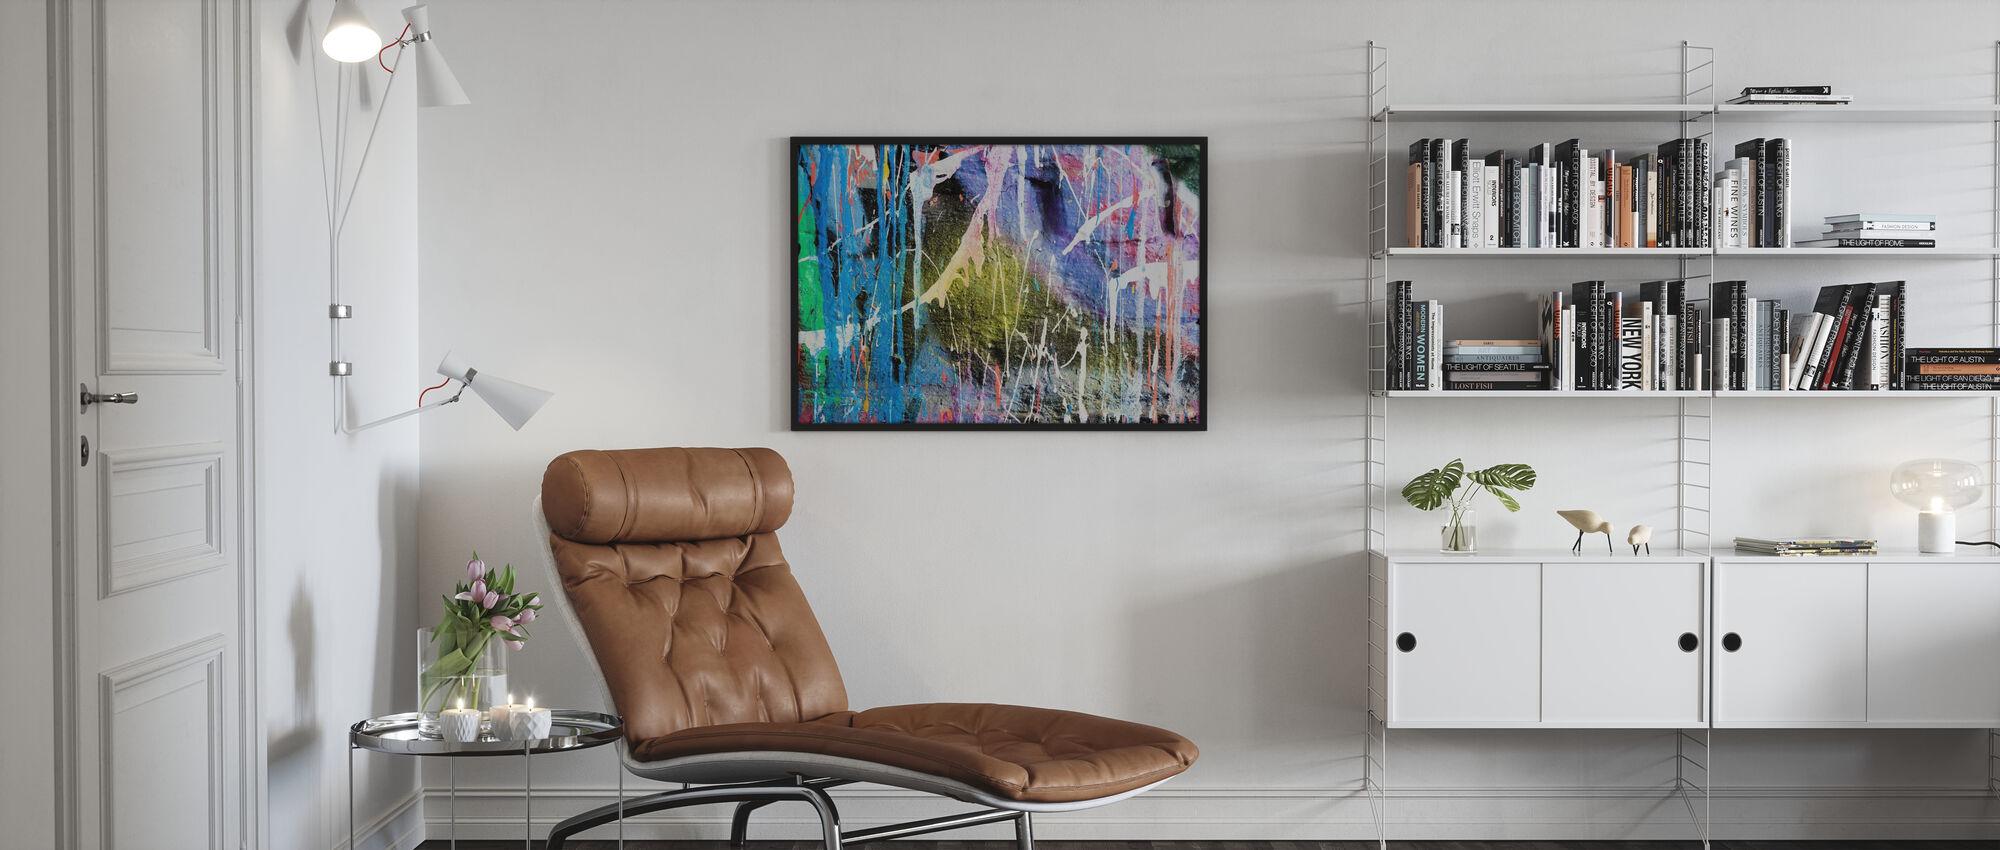 Dripping Paint Graffiti Wall - Framed print - Living Room